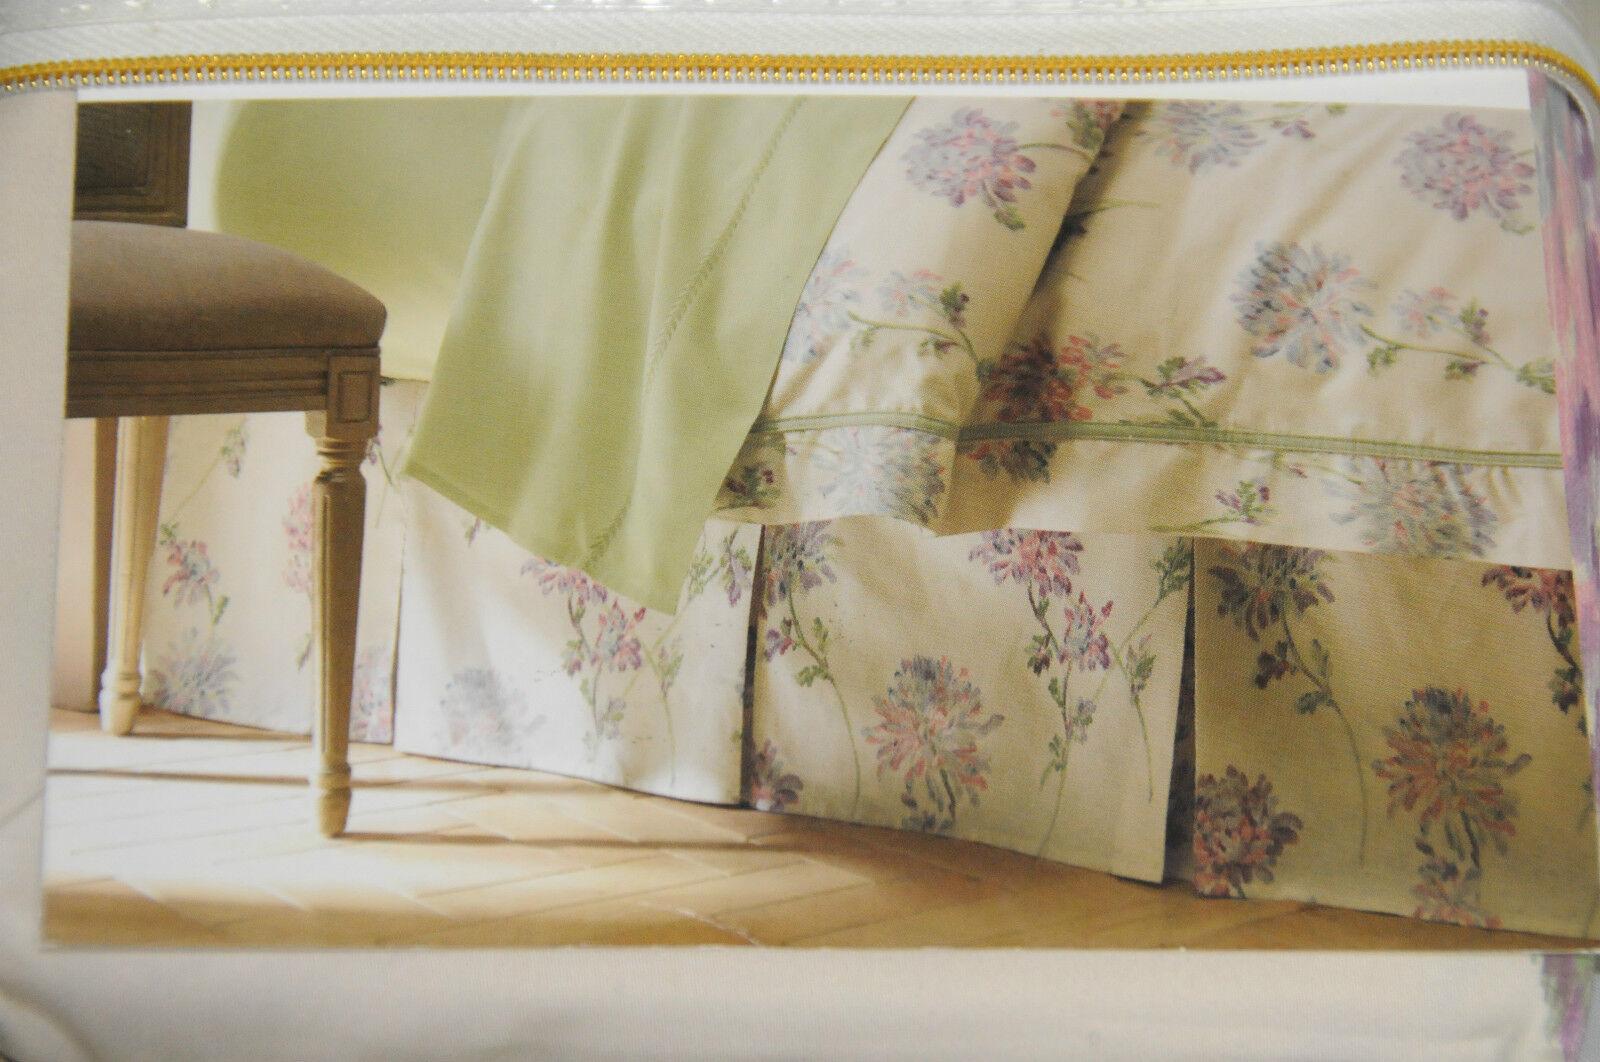 NEW Court of Versailles ONDINE King Queen Floral Sateen cotton PLEATS Bed Skirt